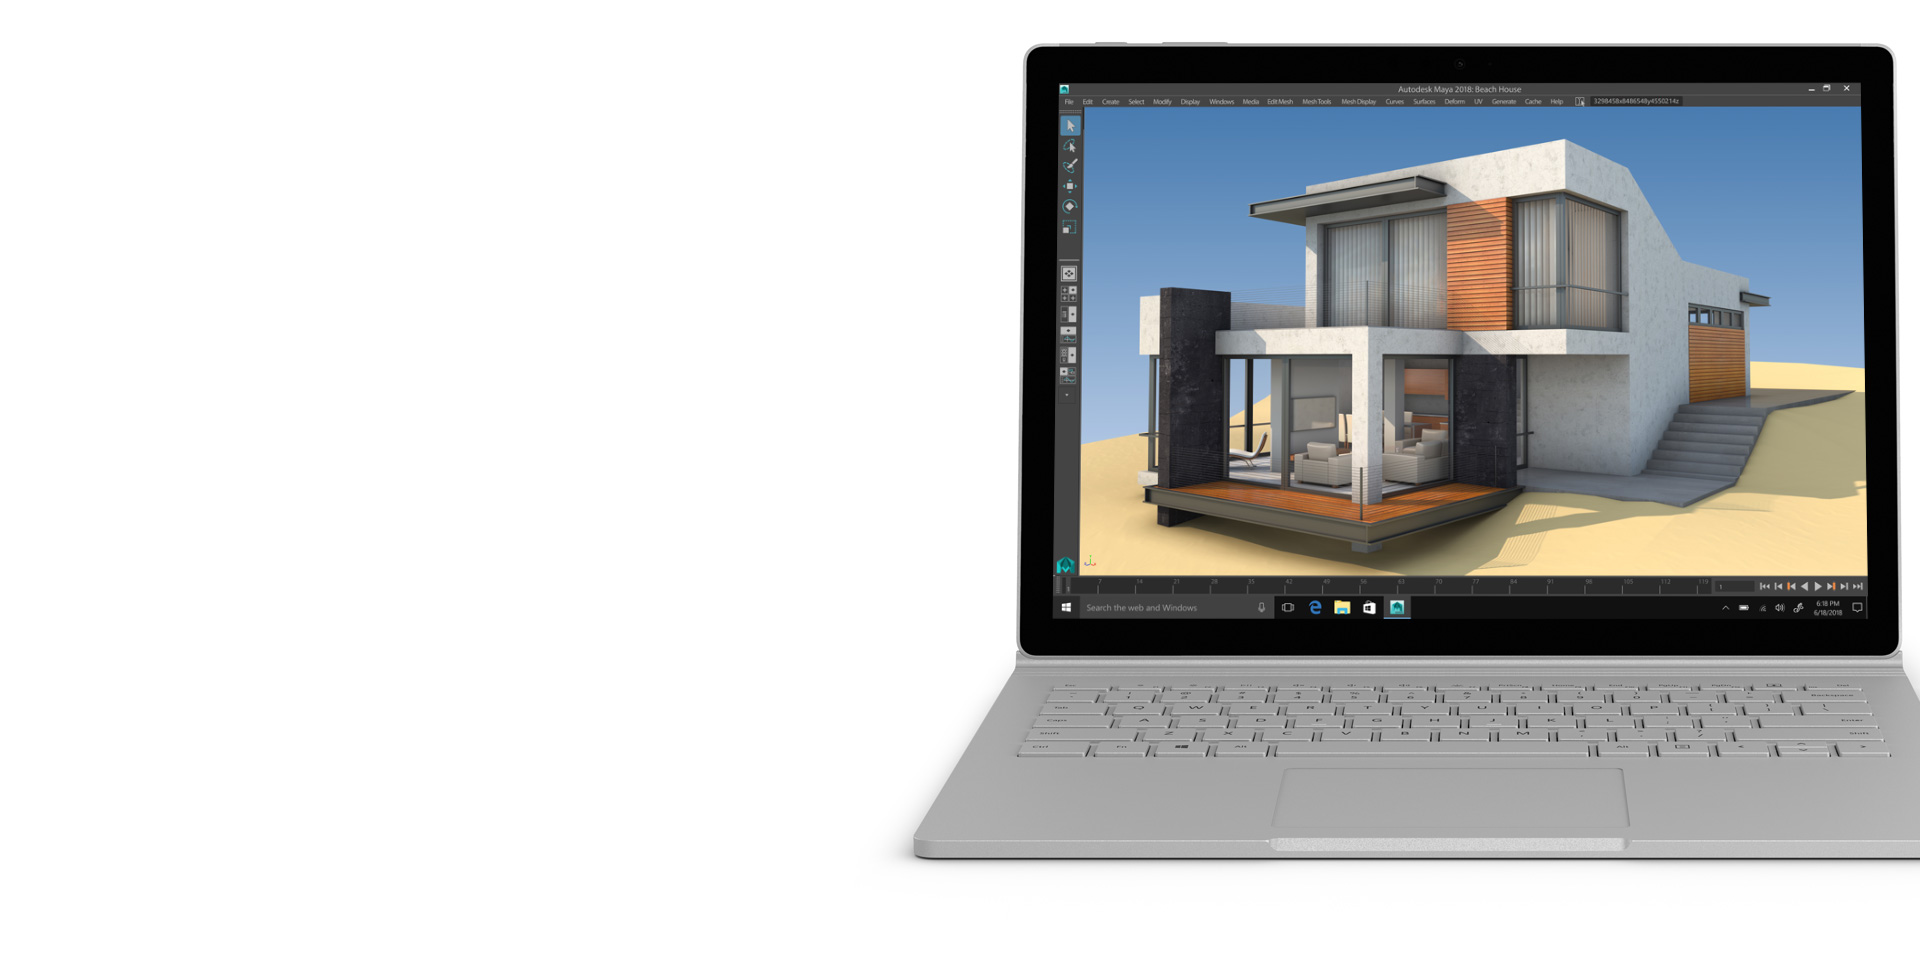 Paparan Autodesk Maya pada Surface Book 2